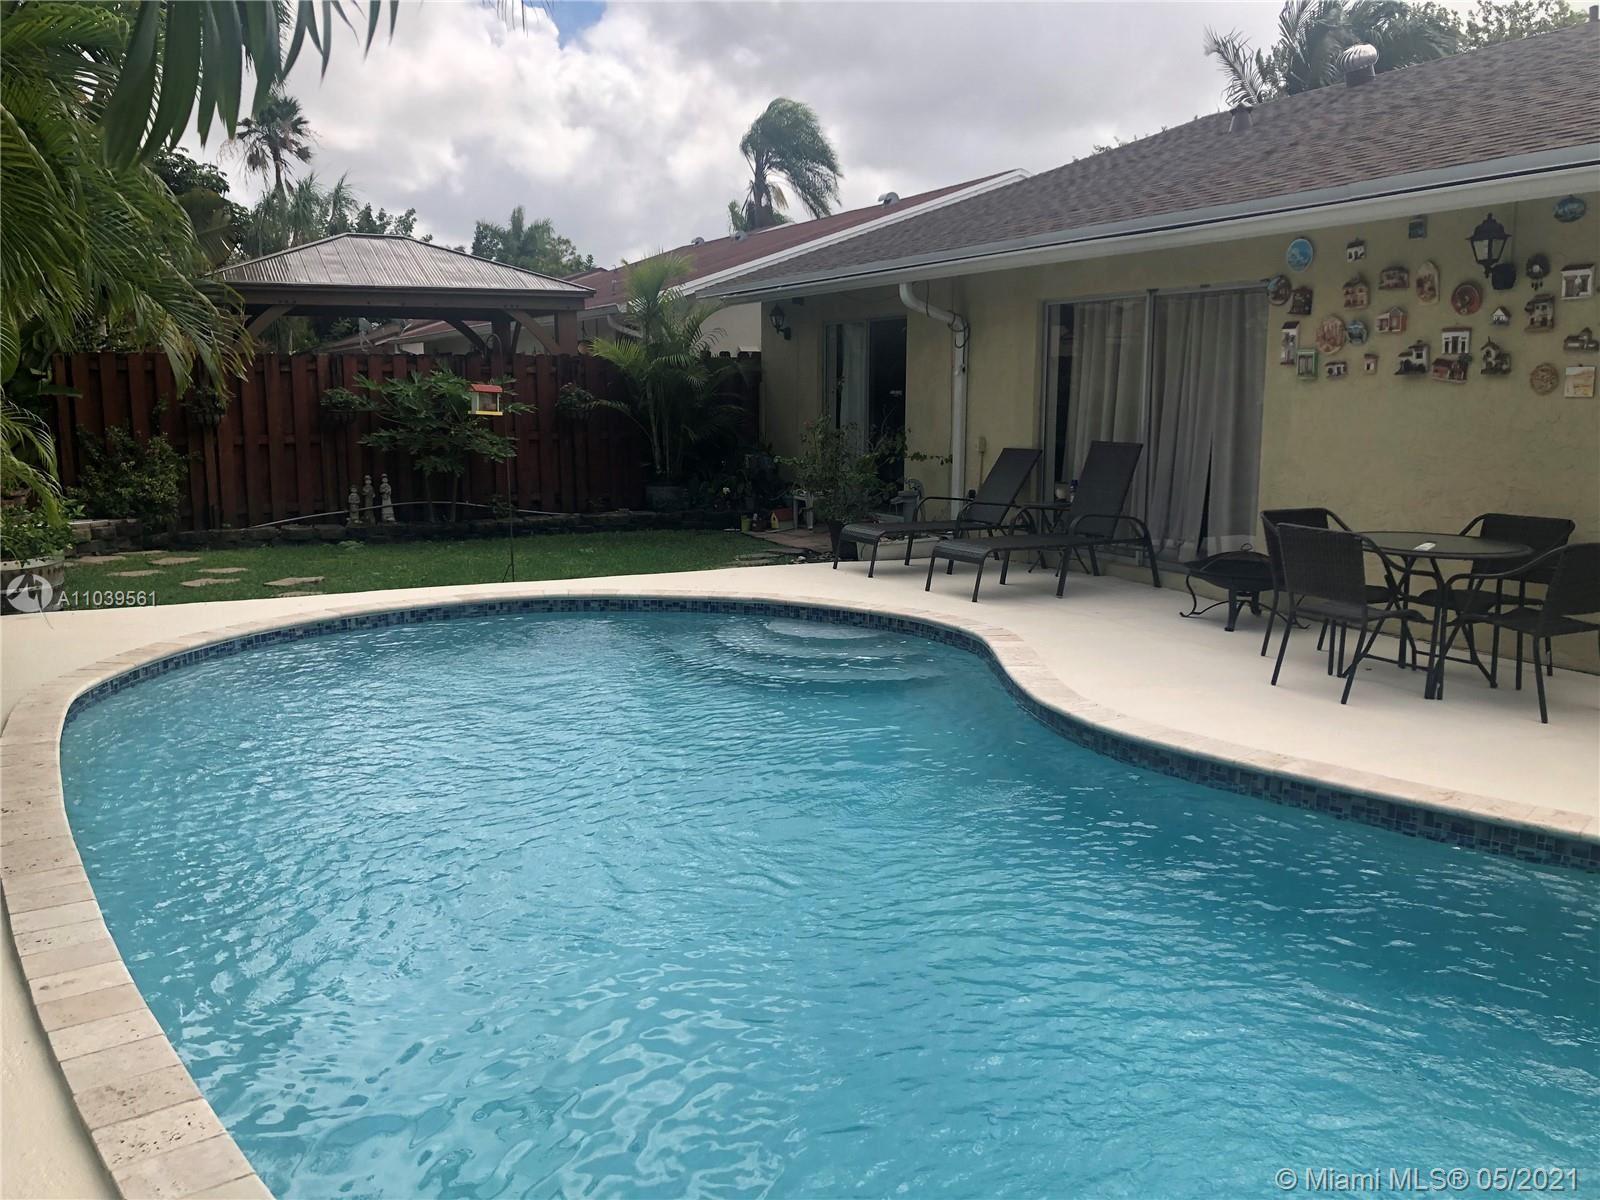 Photo of 10115 SW 144th Pl, Miami, FL 33186 (MLS # A11039561)